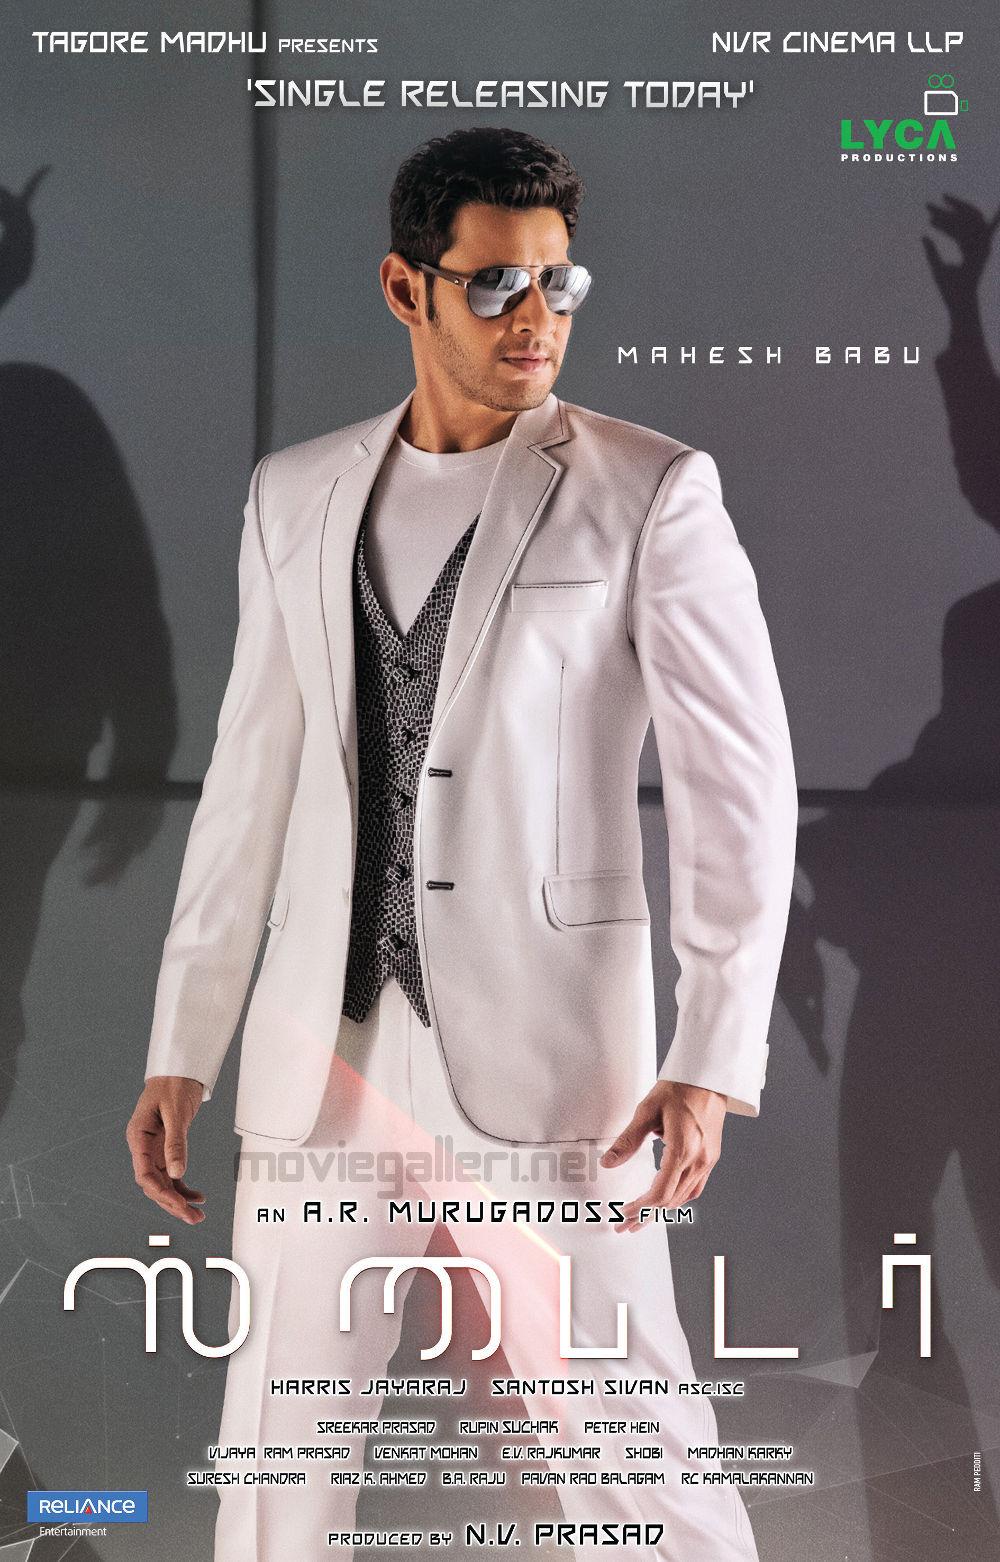 Mahesh Babu's Spyder Movie Single Releasing Today Posters